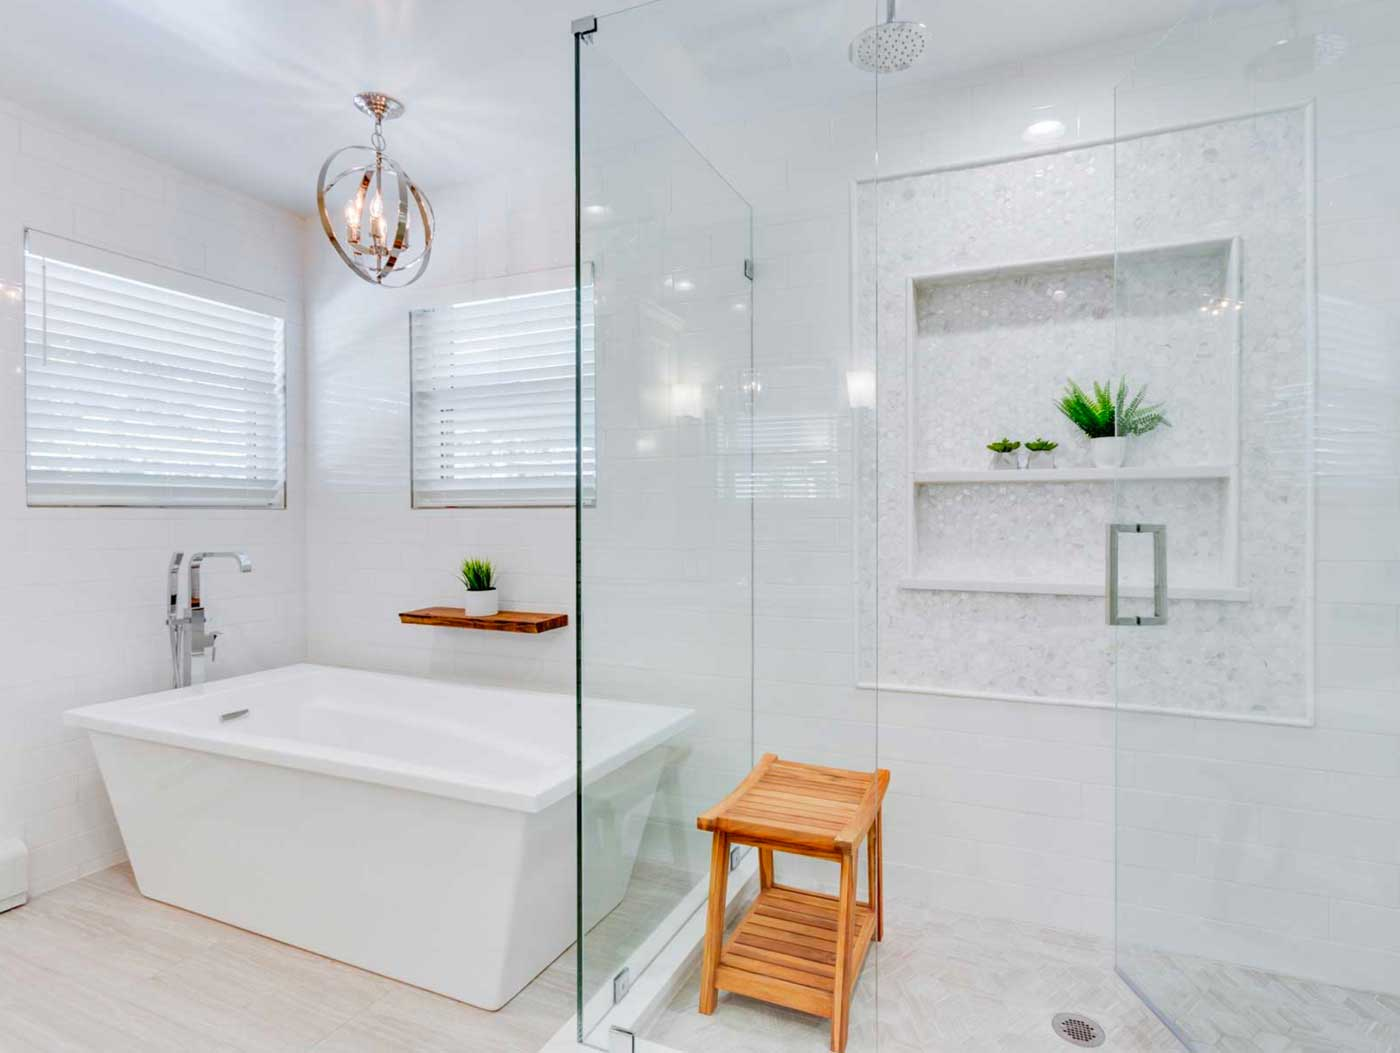 Denver interior designer